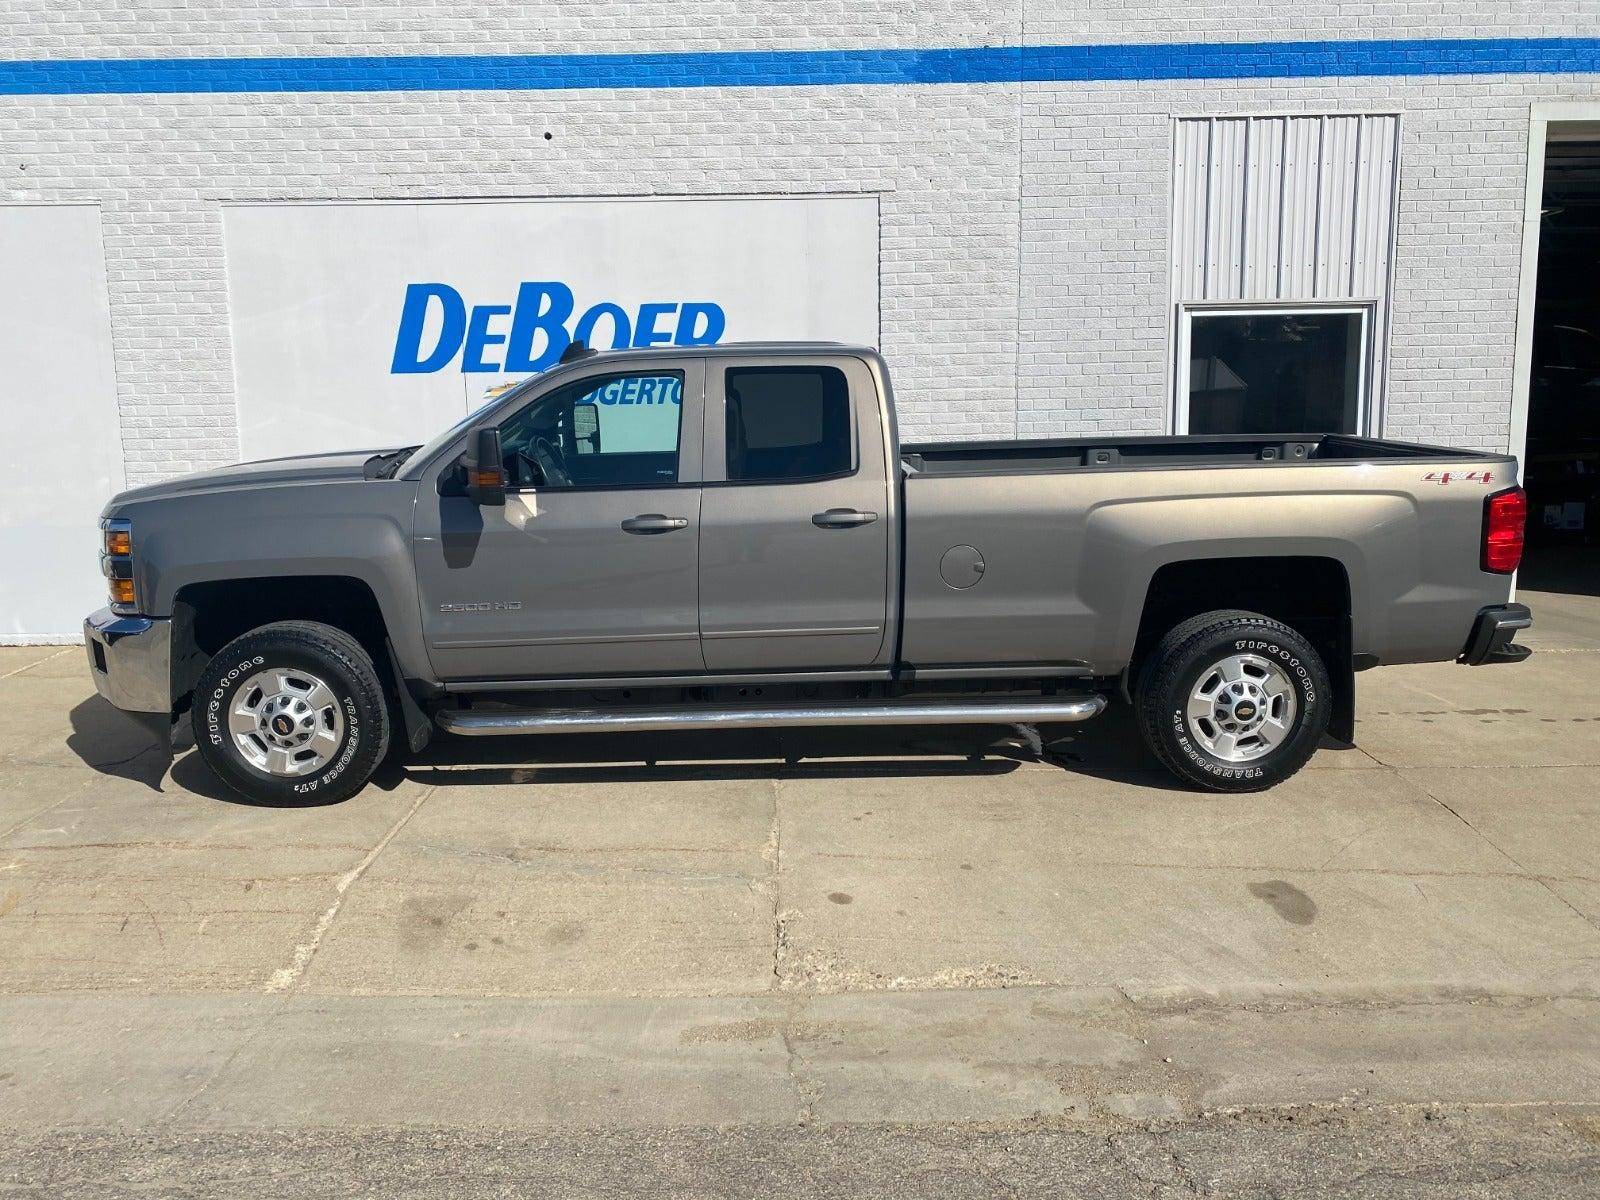 Used 2017 Chevrolet Silverado 2500HD LT with VIN 1GC2KVEG4HZ164932 for sale in Edgerton, Minnesota